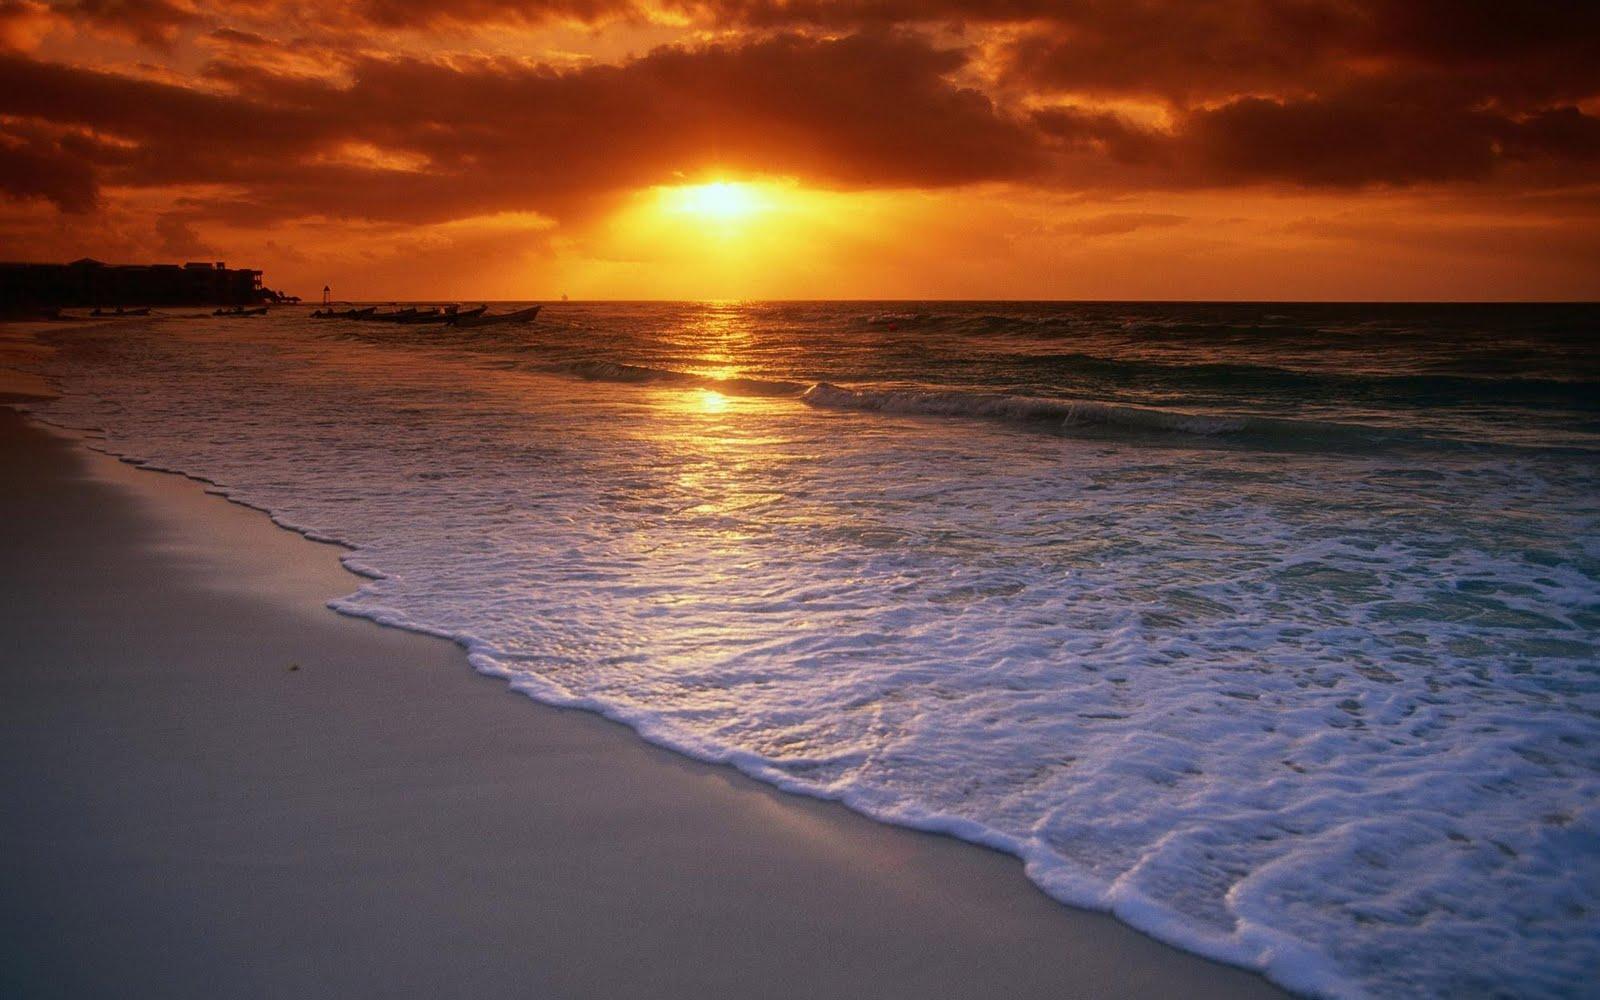 Japan Sunset Beach Wallpapers for Desktop Backgrounds 1600x1000